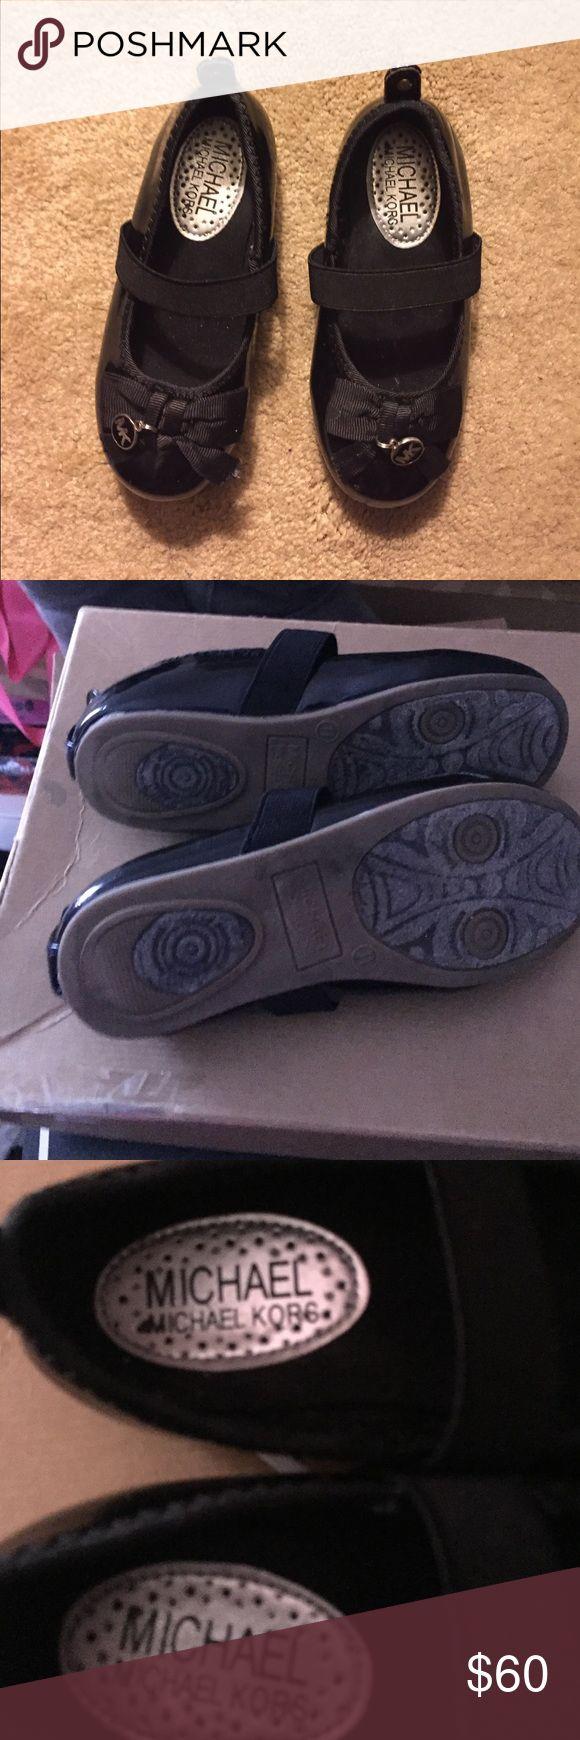 Little girls shoes Michael Kross in great wearable condition Michael Kors Dresses Formal